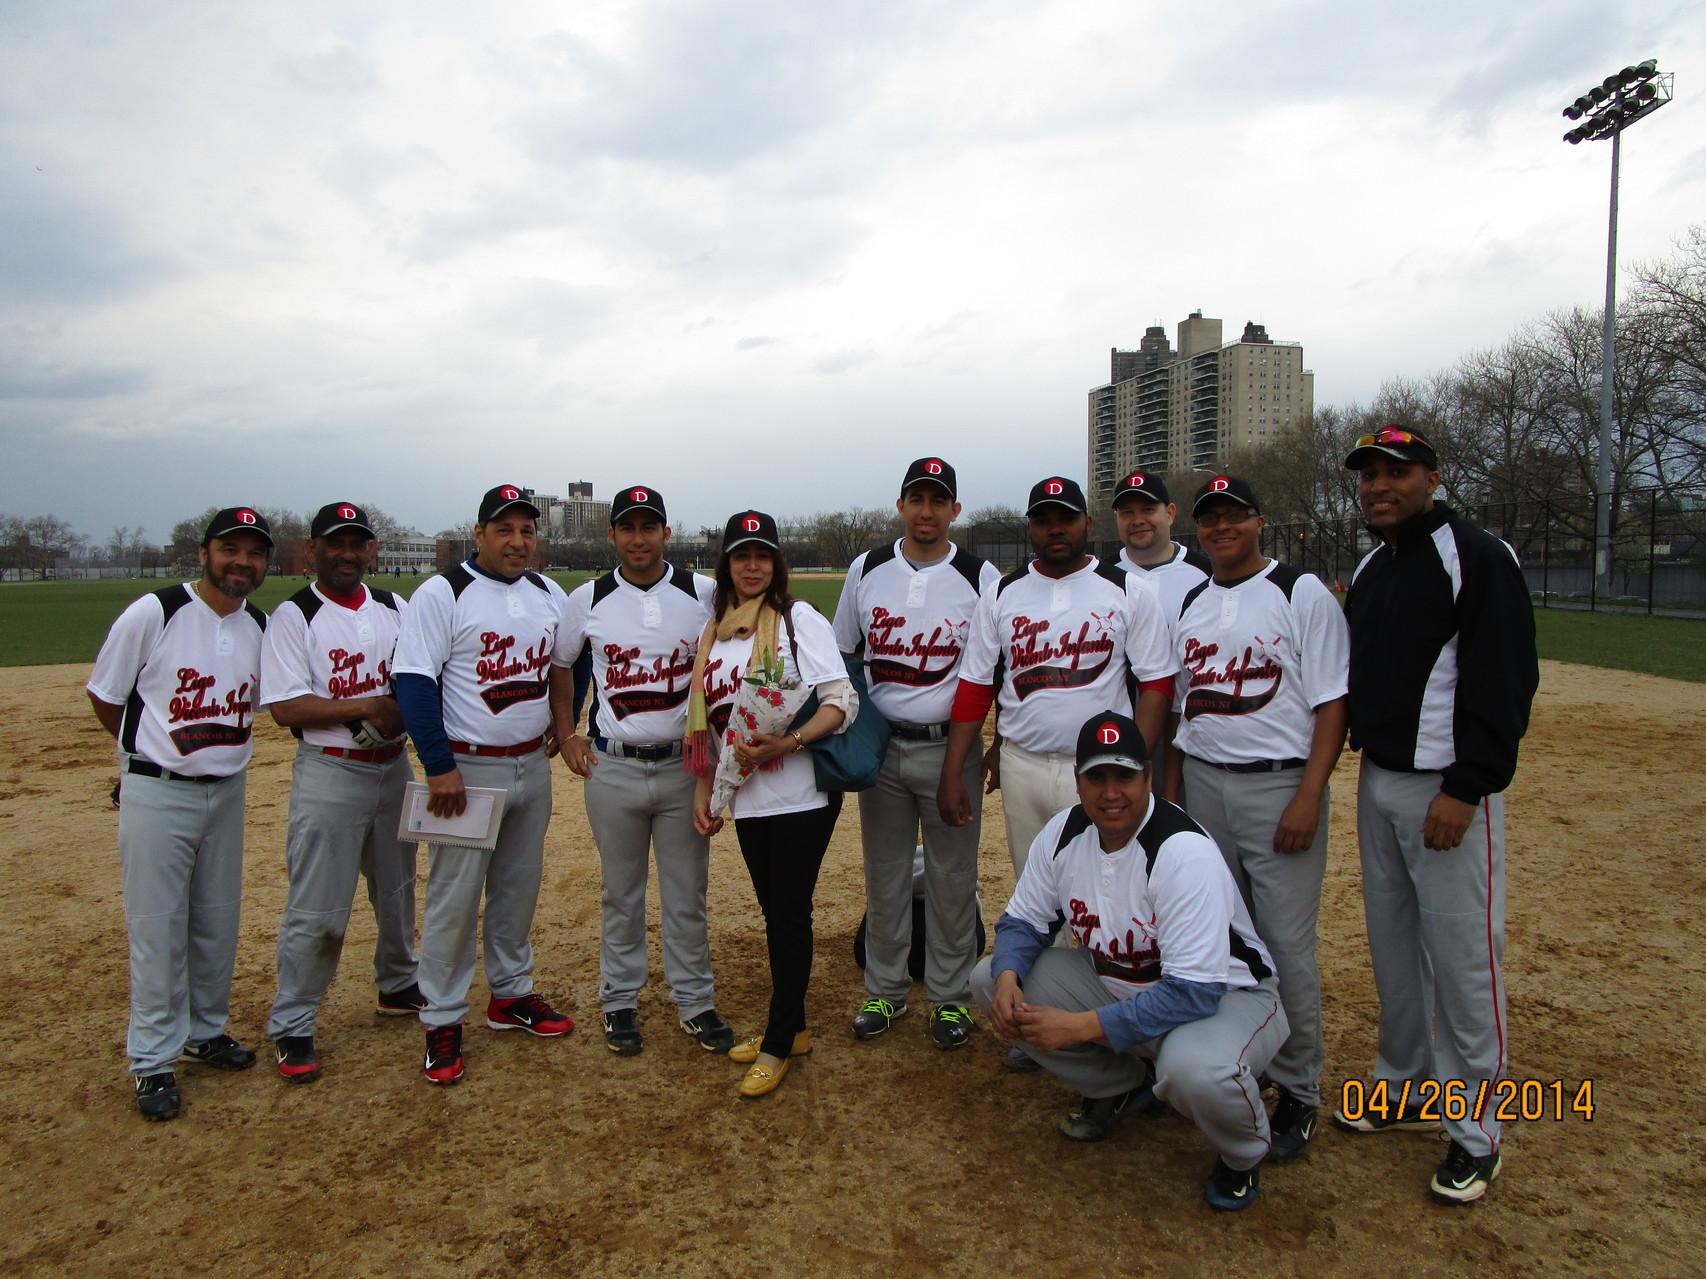 Los Blancos, 2014.  www.livinfante.com